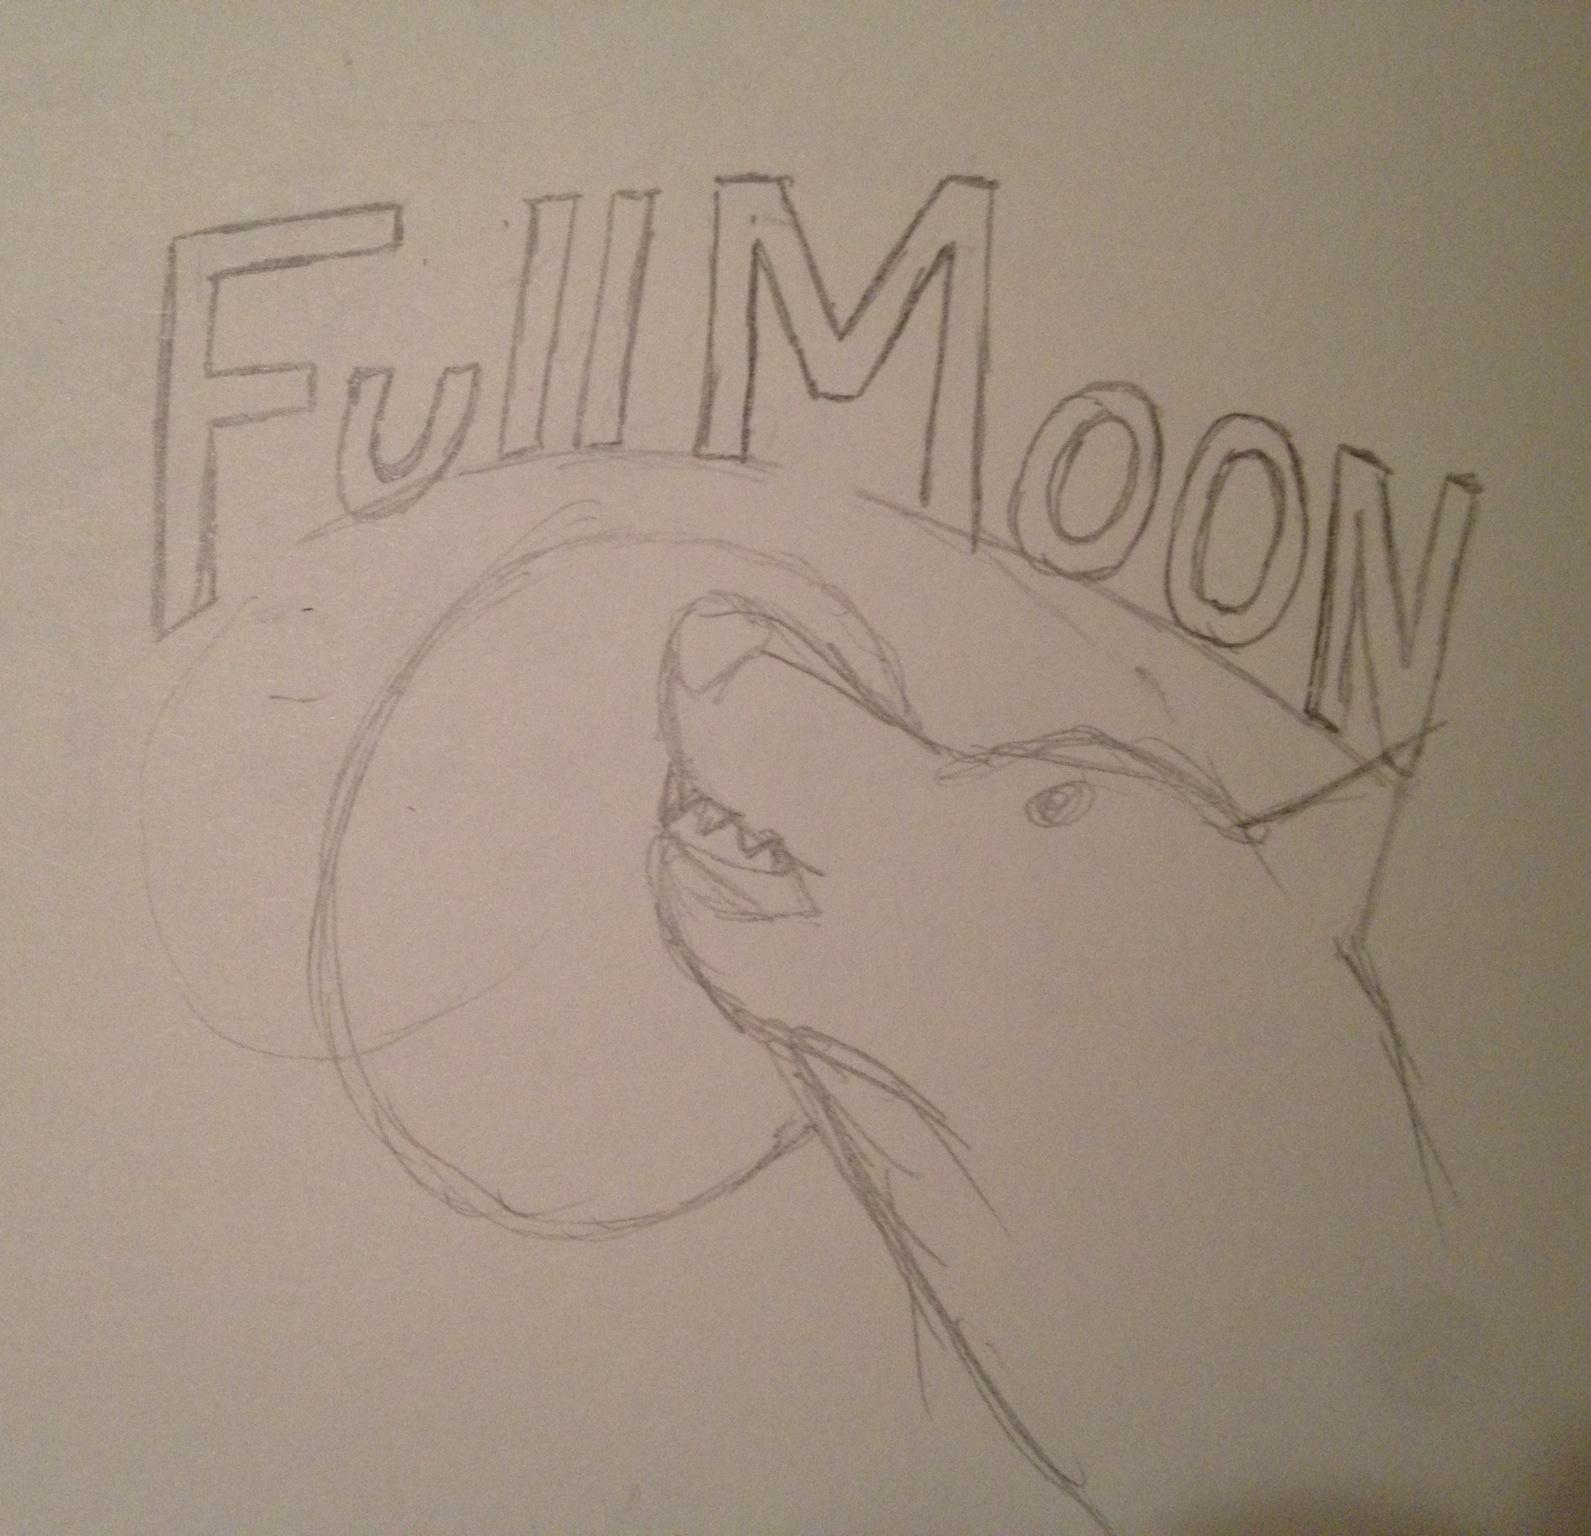 Full Moon Appalachian Moonshine - image 9 - student project